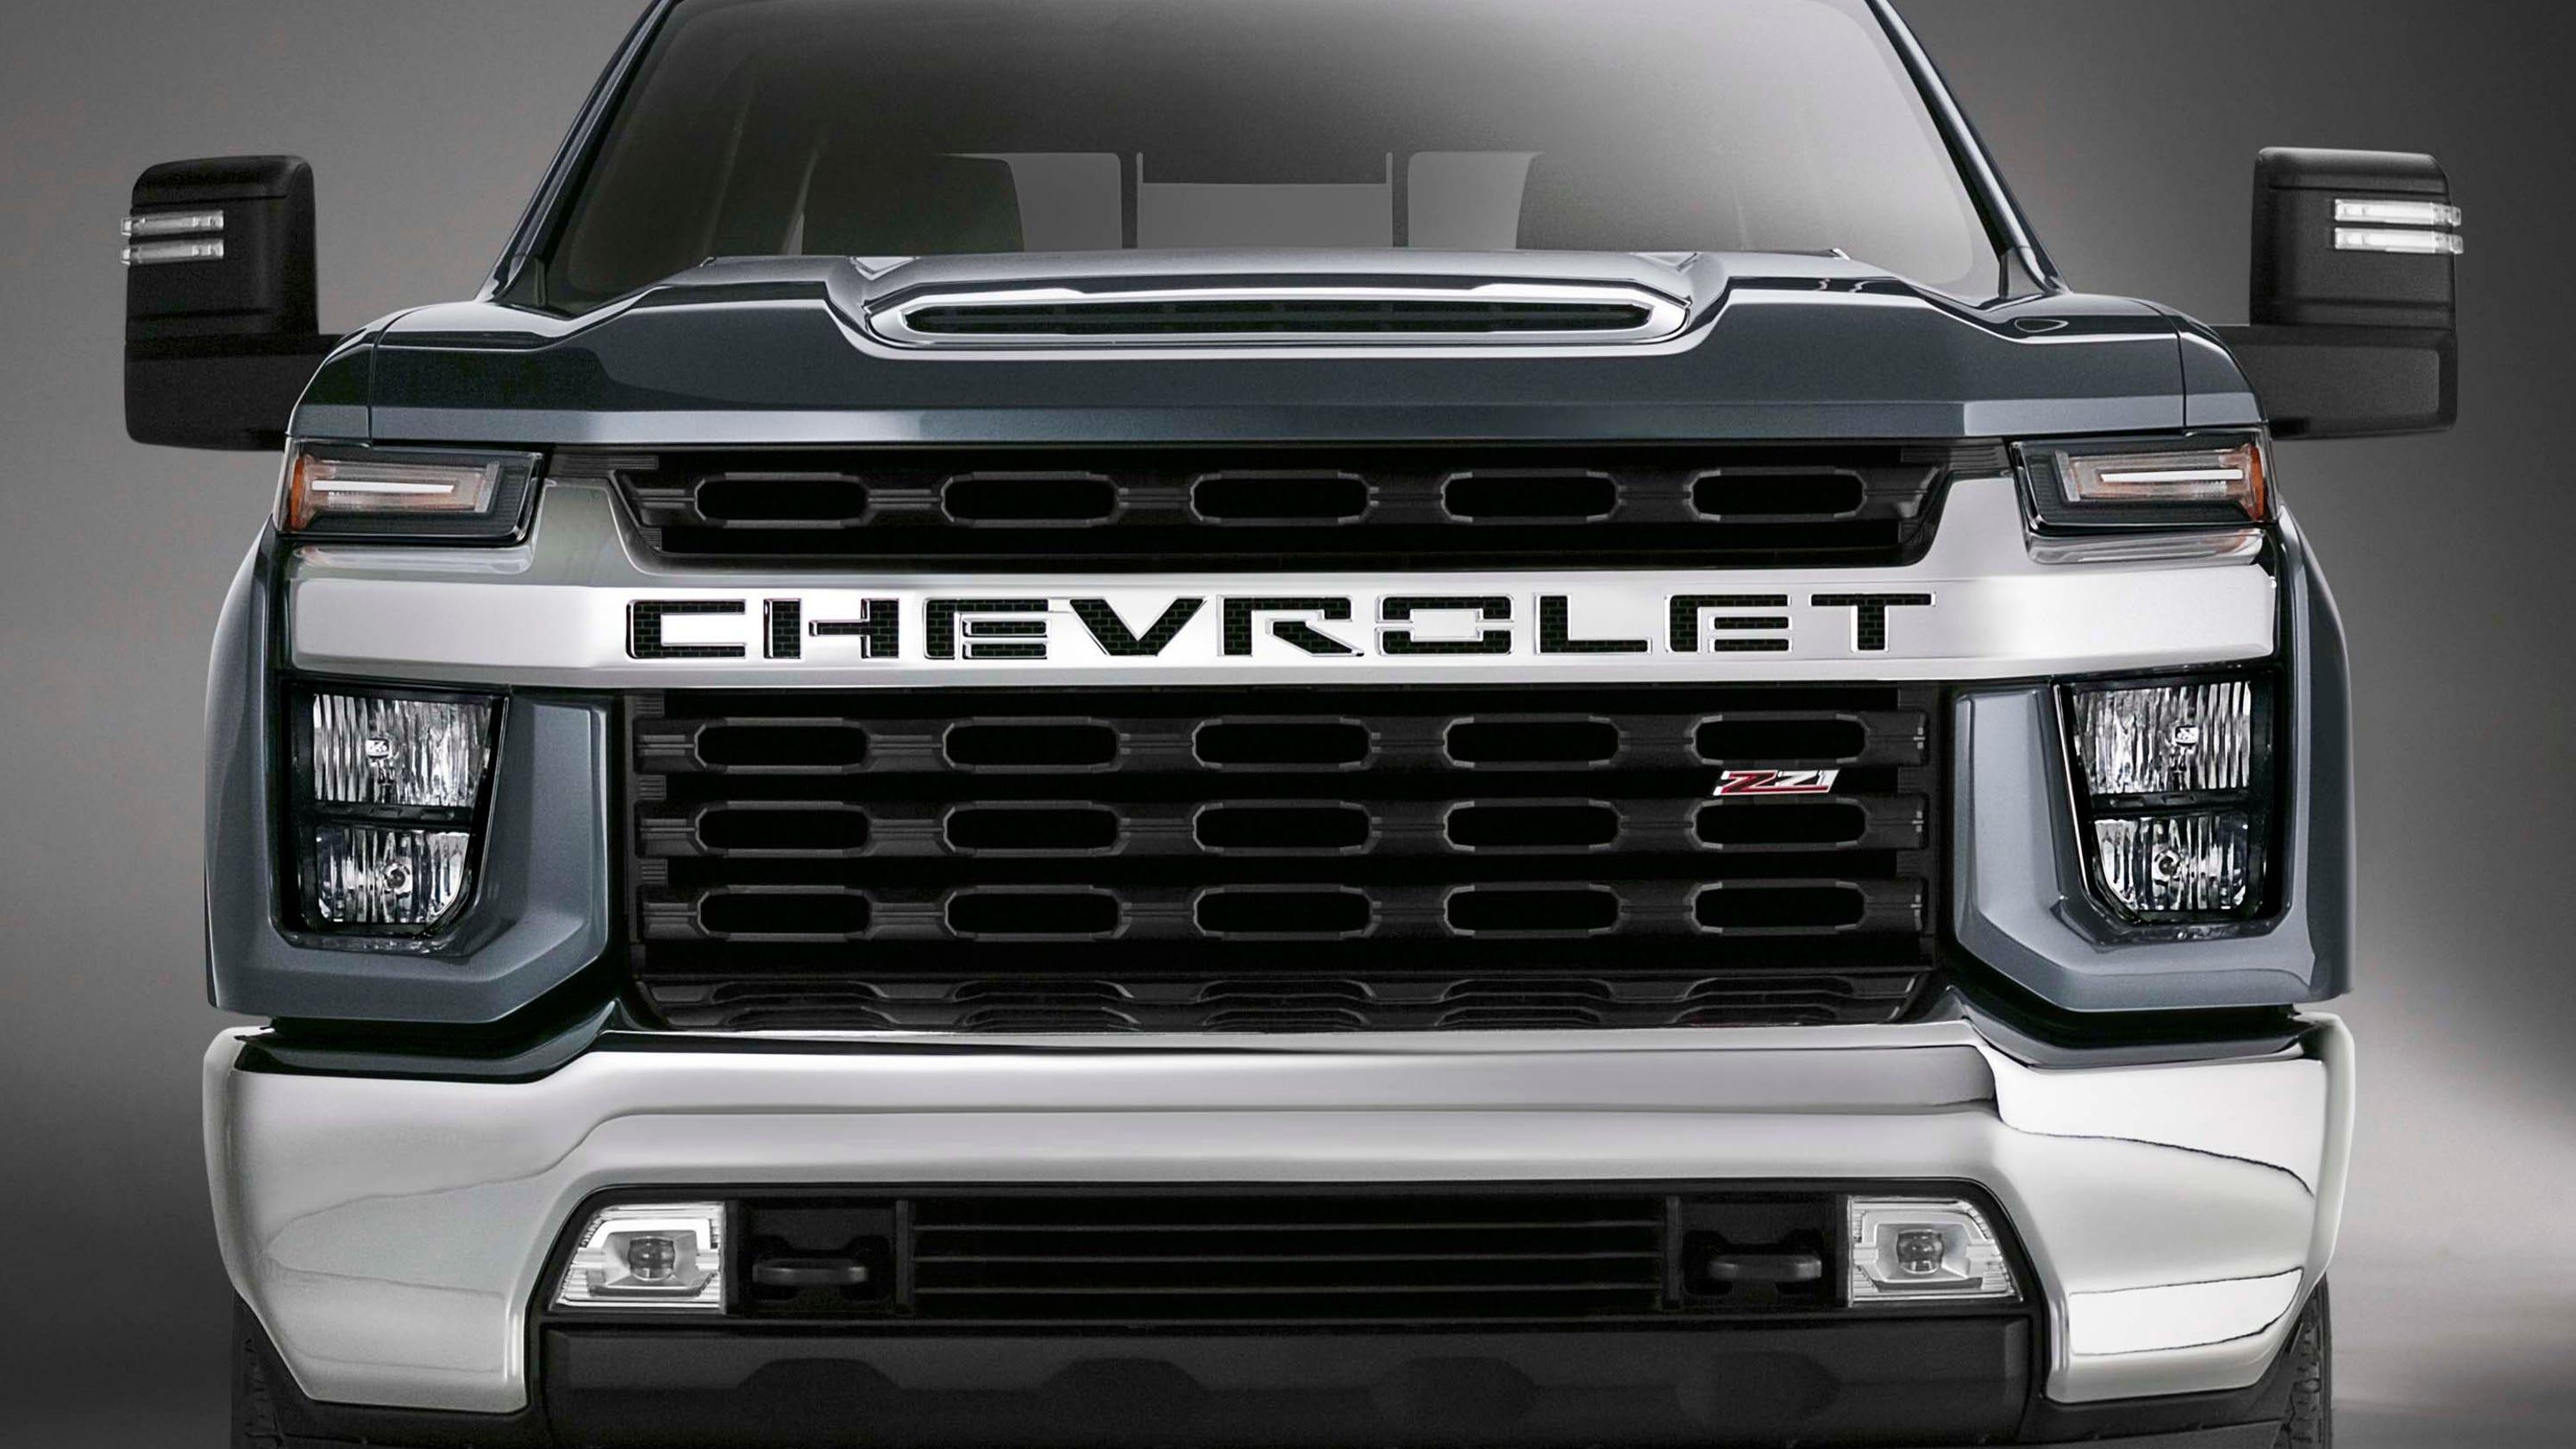 GM's heavy Chevy Silverado HD makes its debut